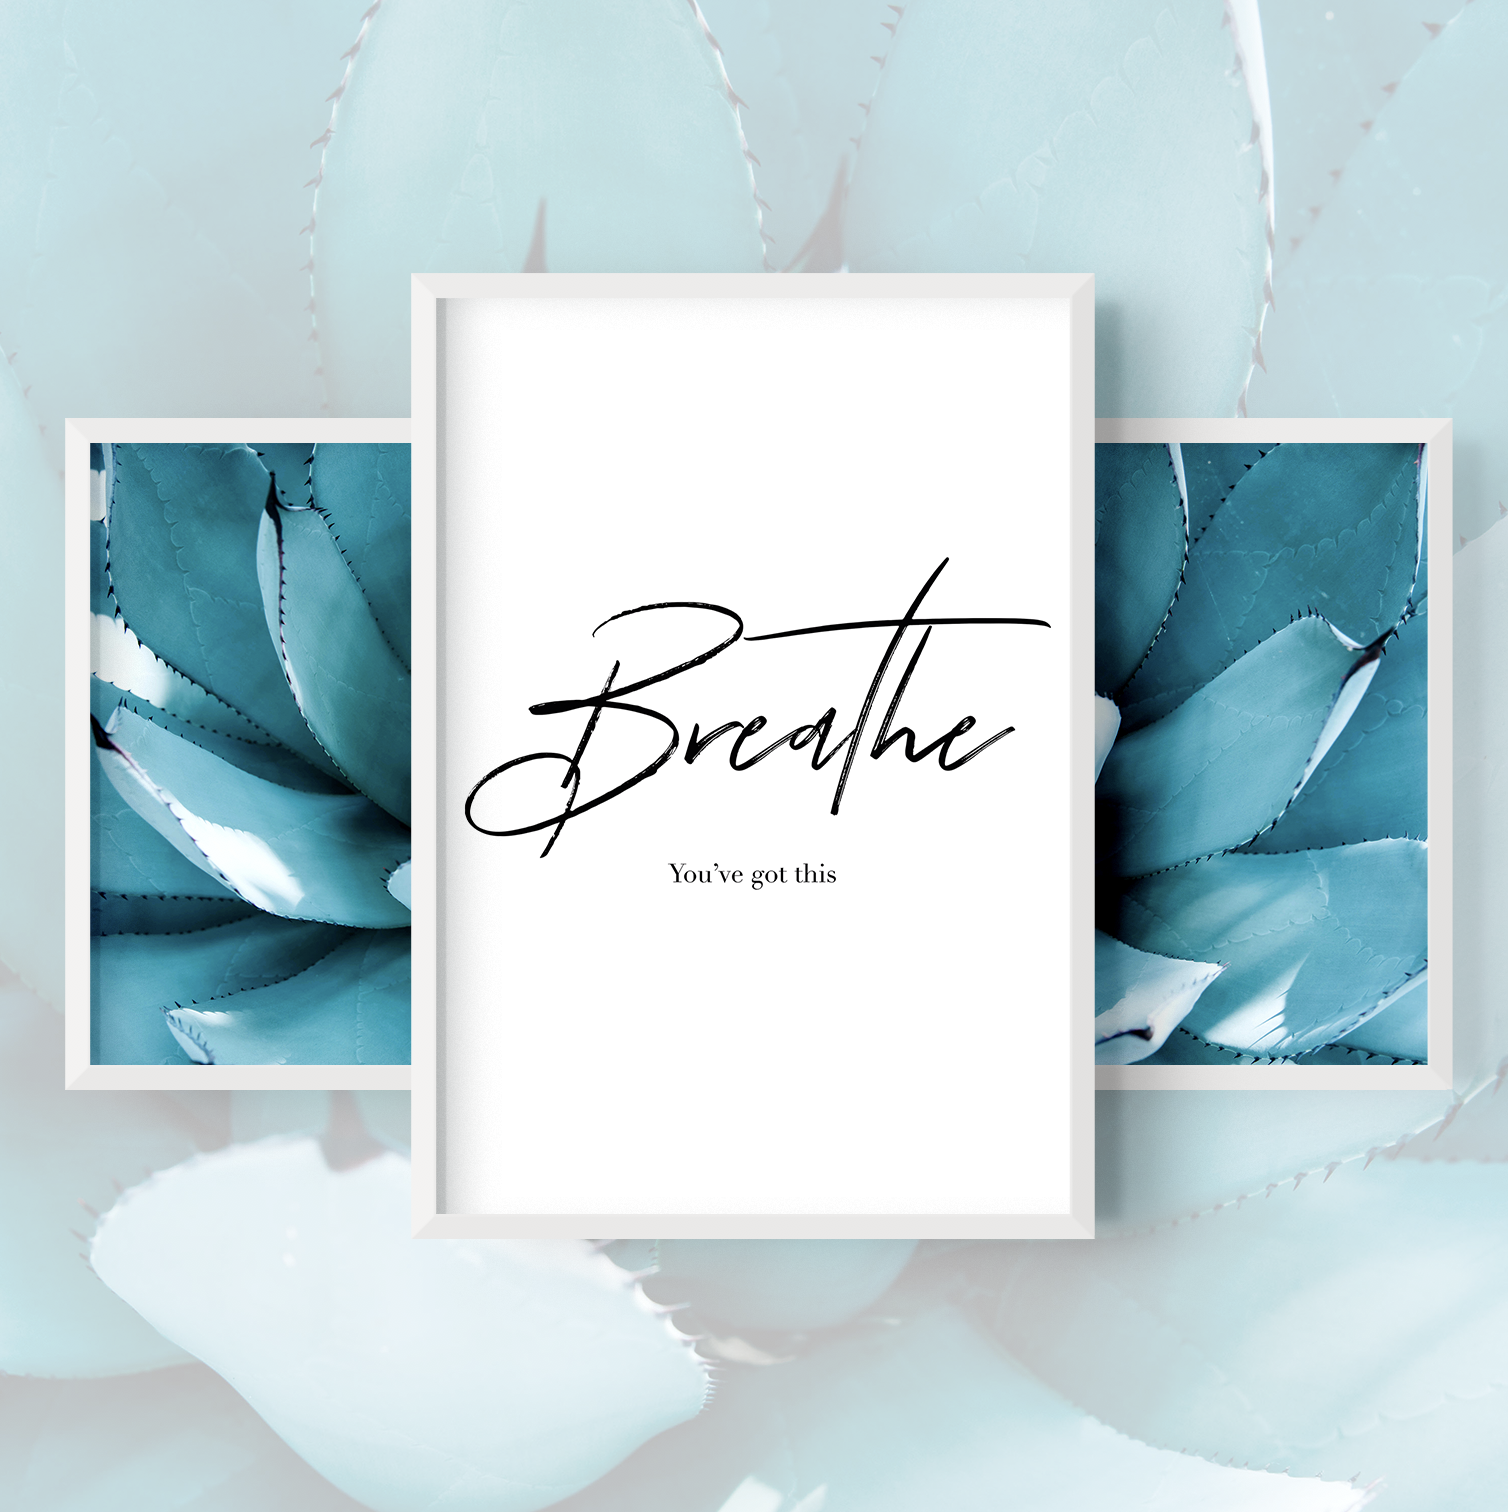 Breathe Blue Agave Home Decor Prints in 2020 Prints